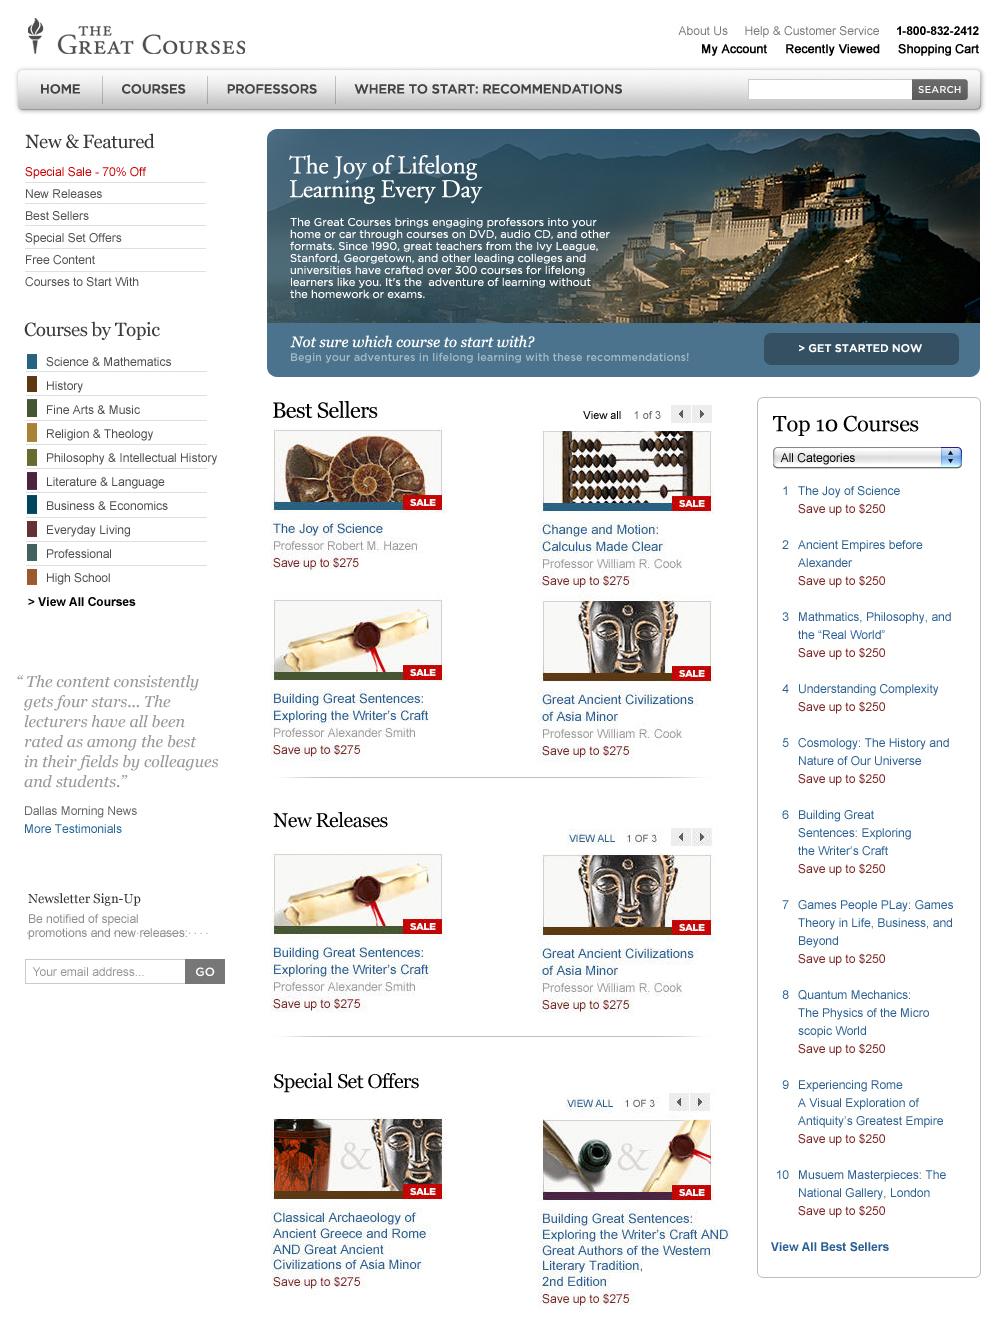 Website wireframe skinning and banner design